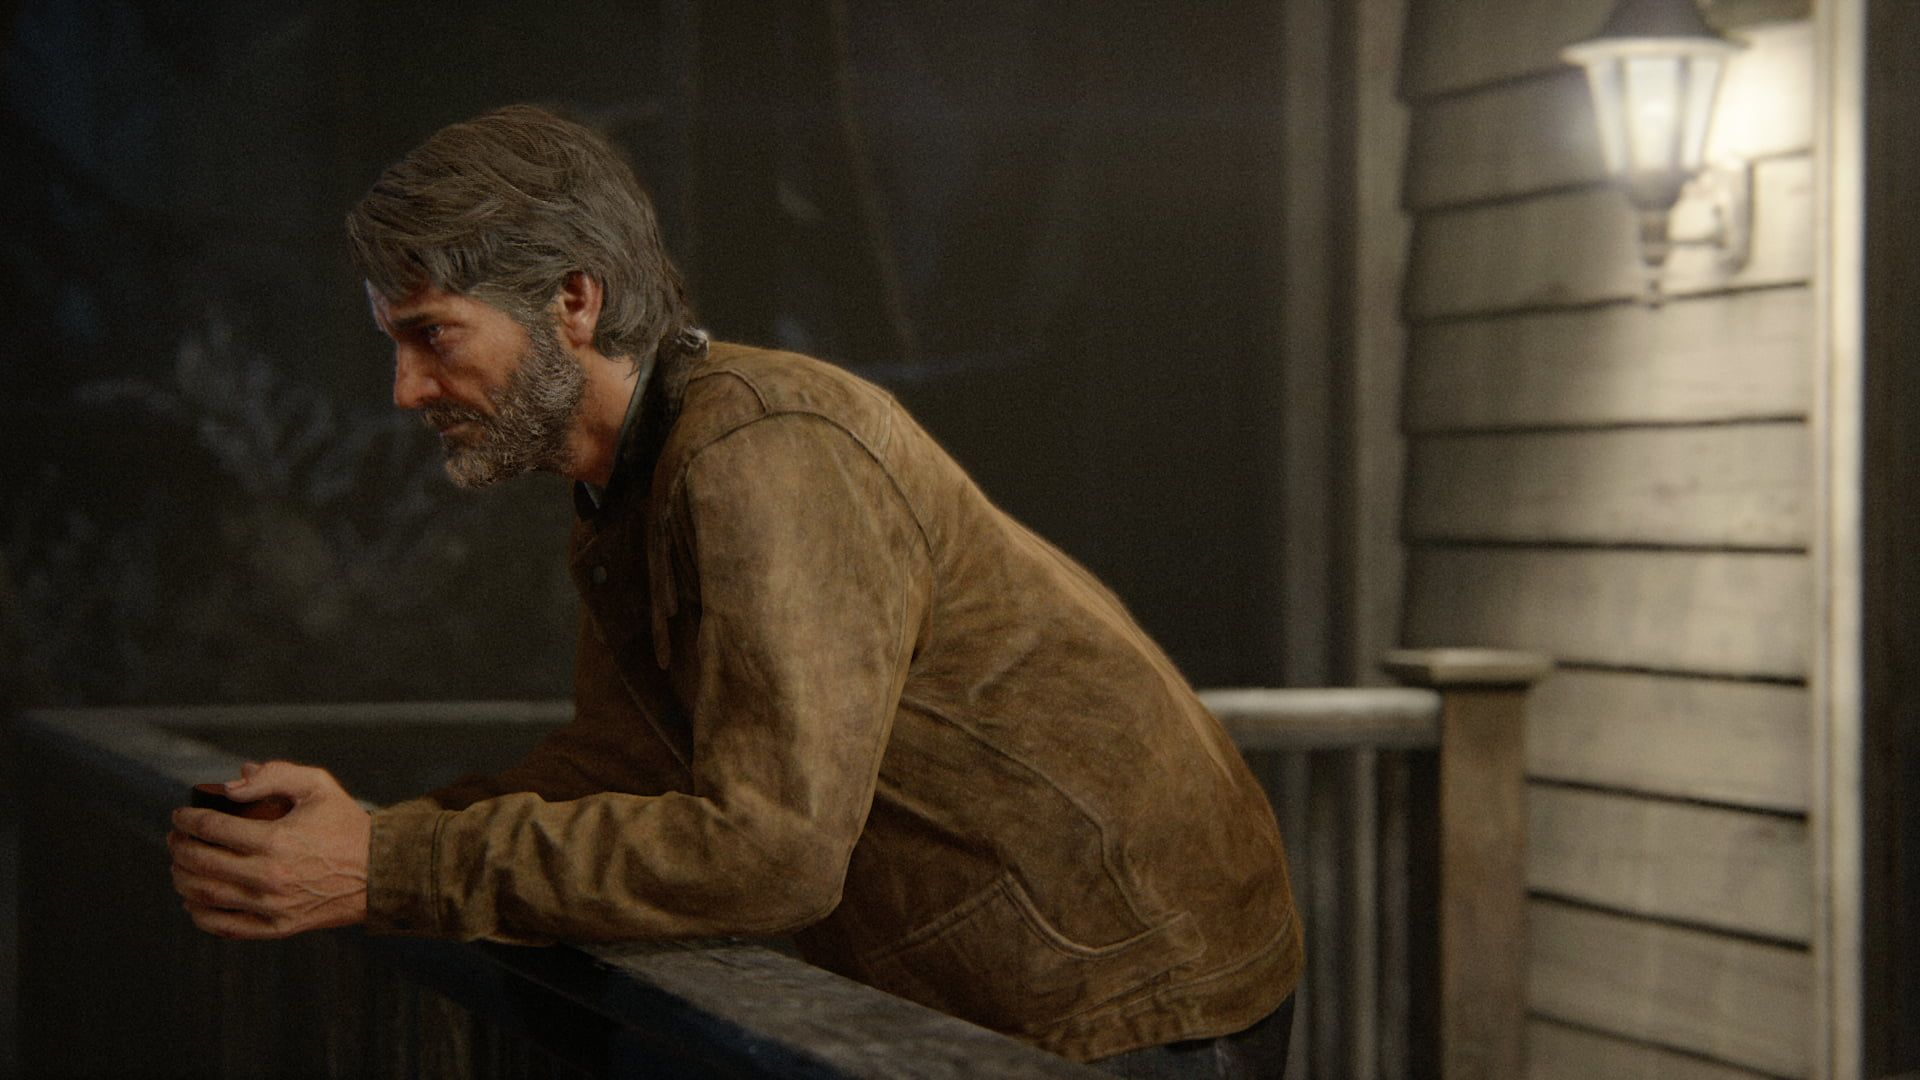 The Last Of Us 2 Joel Miller 1080p Wallpaper Hdwallpaper Desktop The Last Of Us Joel Miller Joel Miller Wallpaper